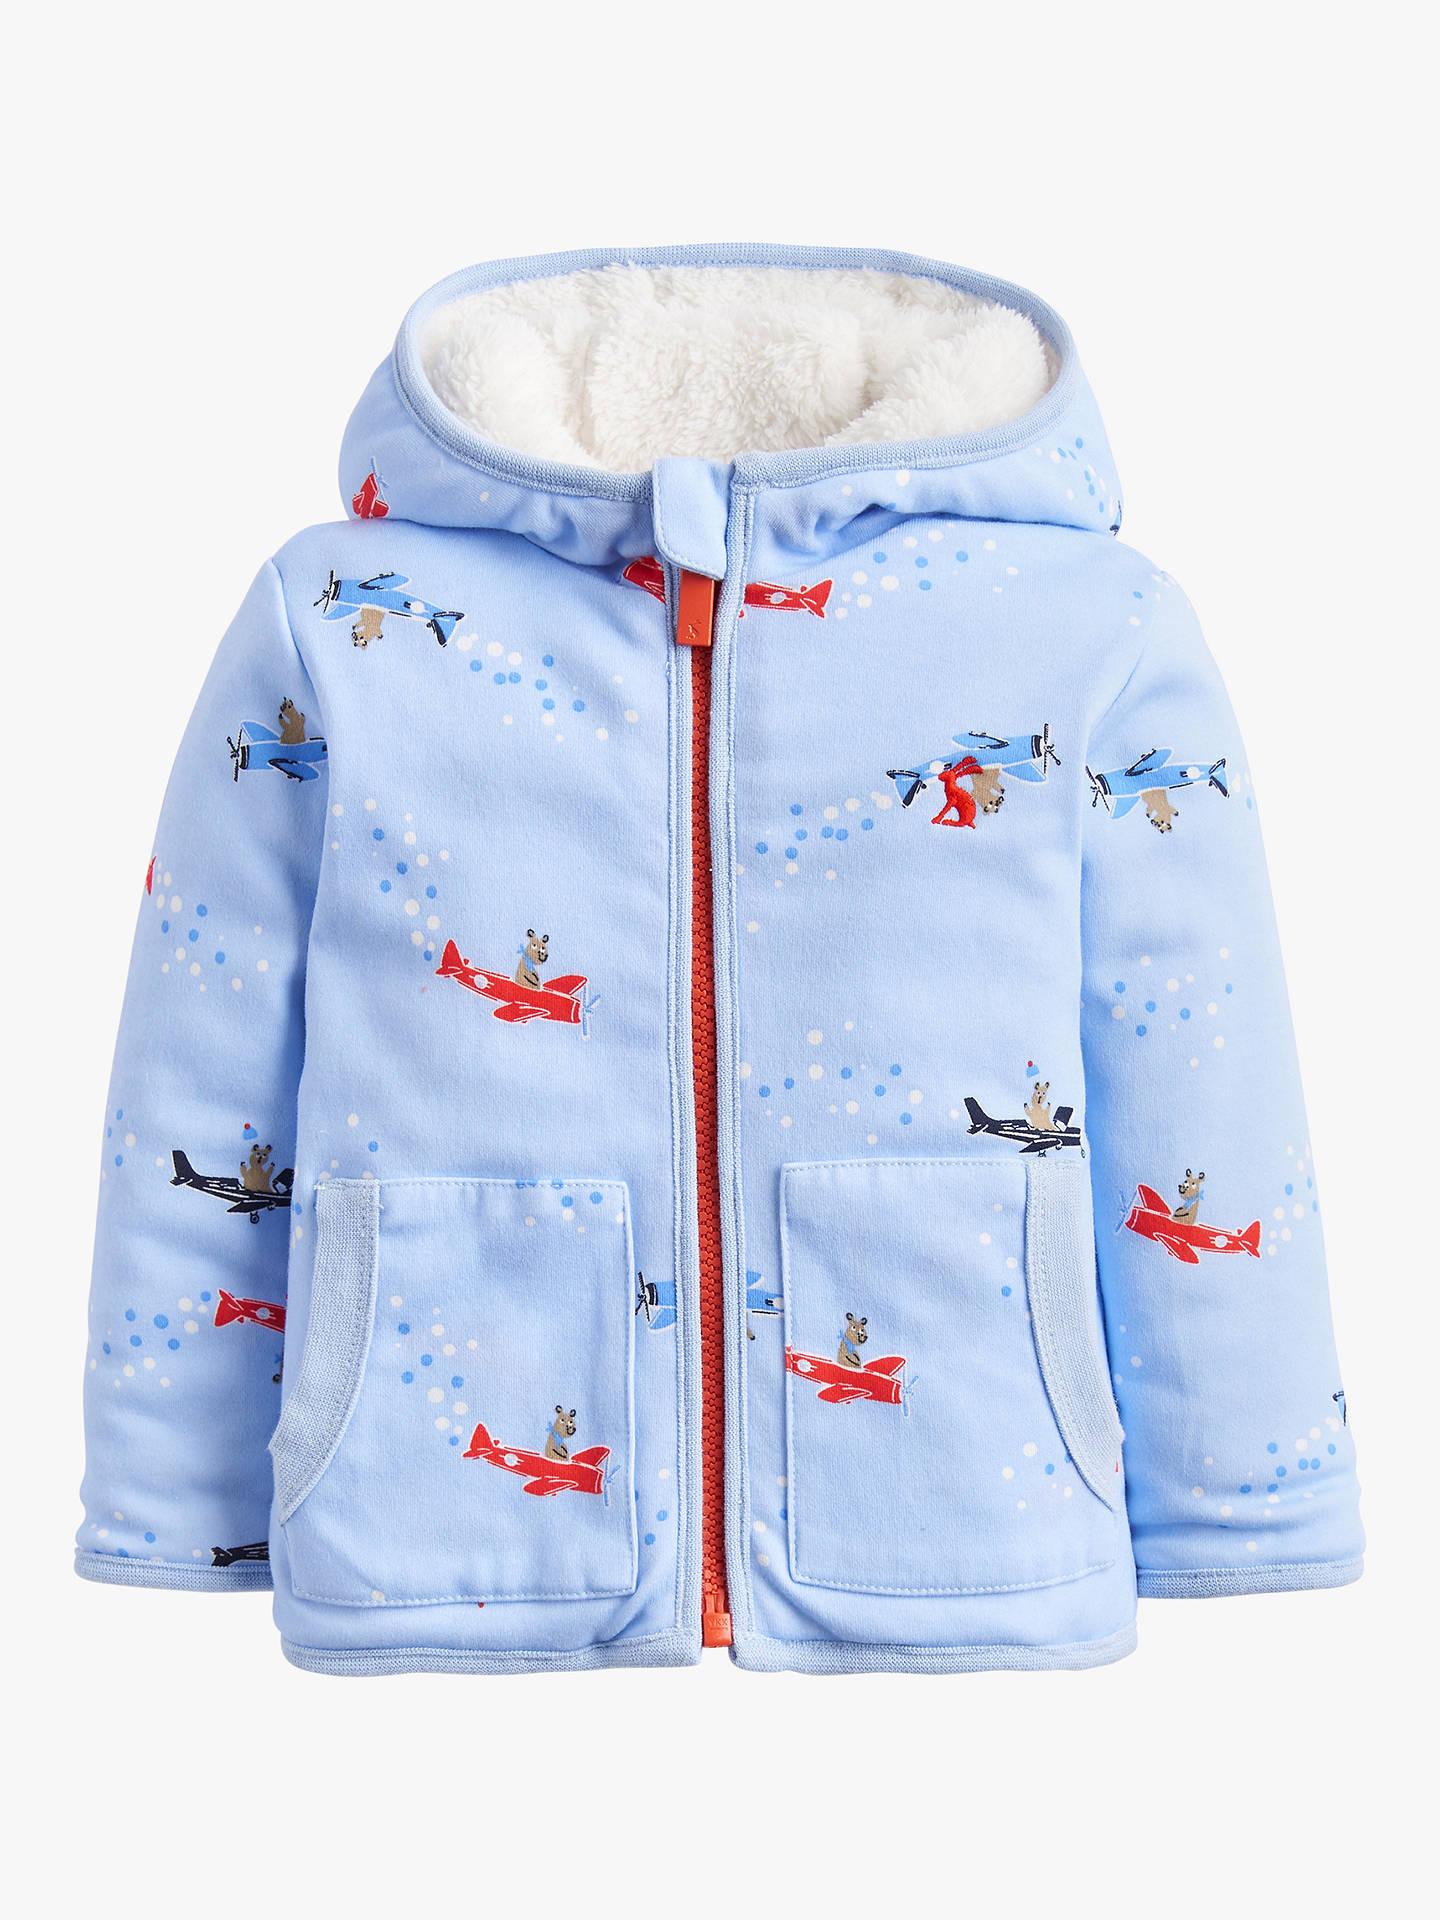 81b8be4b23 Baby Joule James Bears Reversible Jacket, Blue at John Lewis & Partners